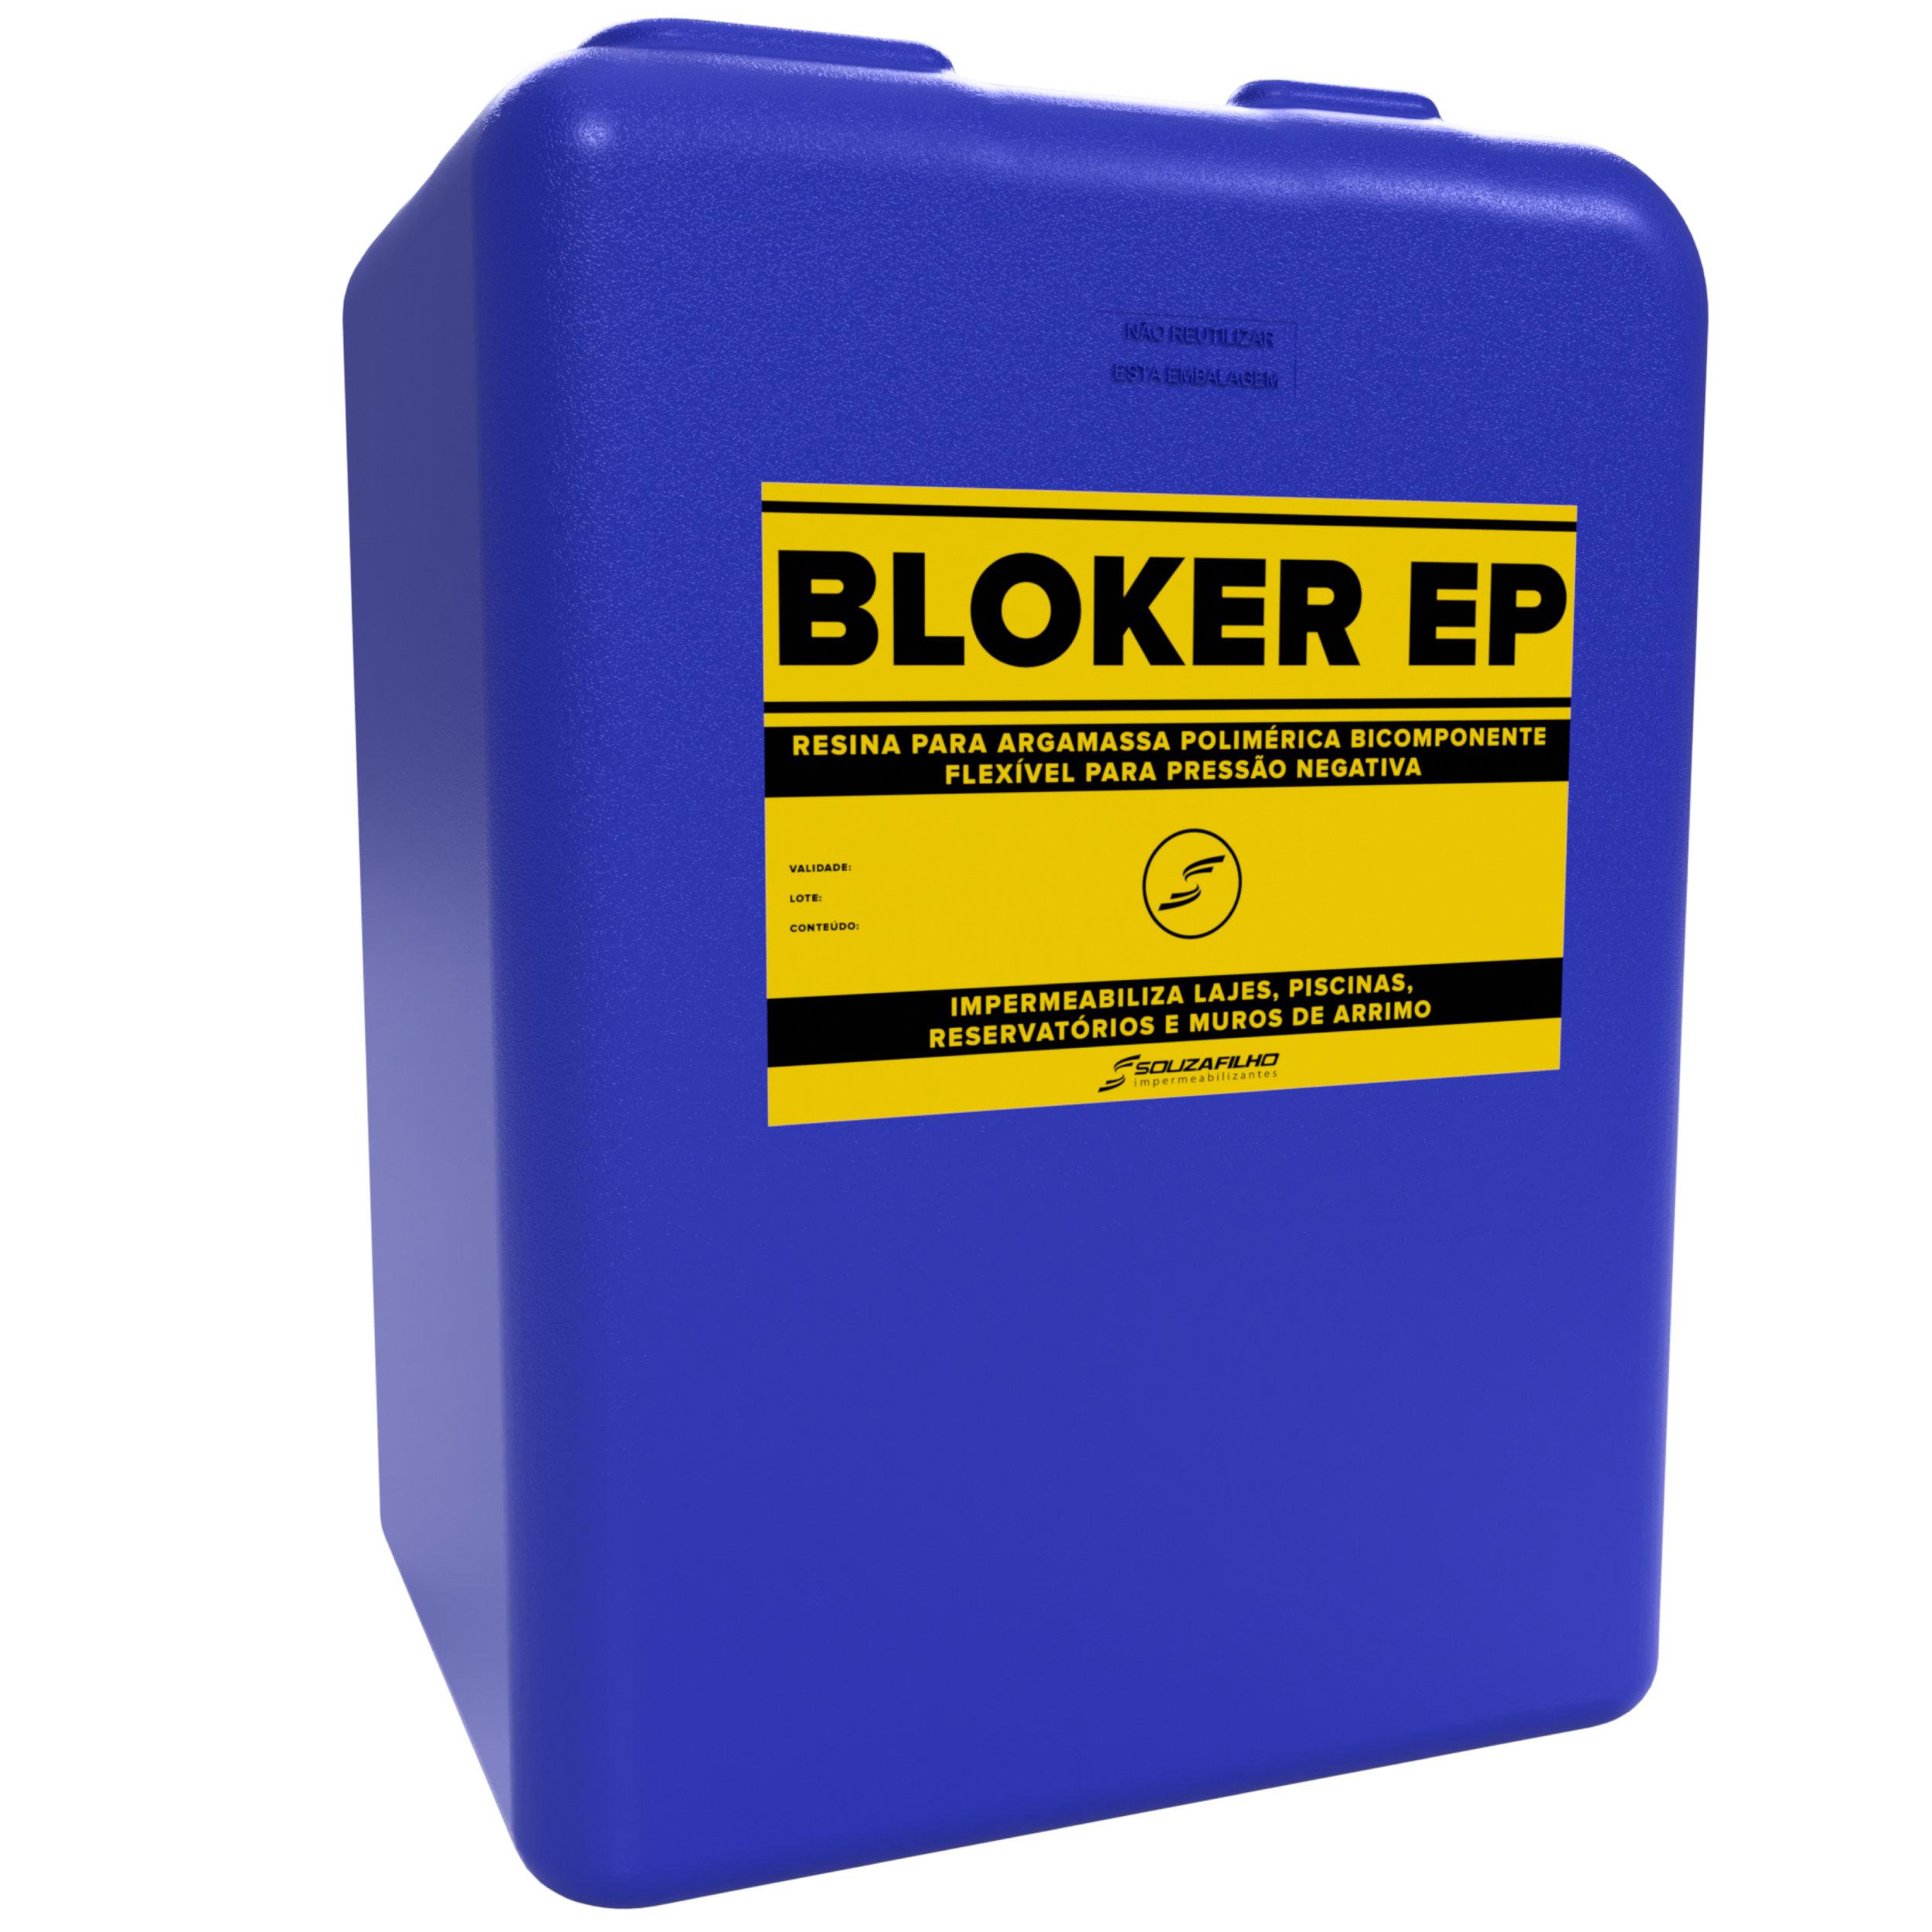 bloker ep argamassa polimerica impermeabilizante flexivel pressao negativa.jpg